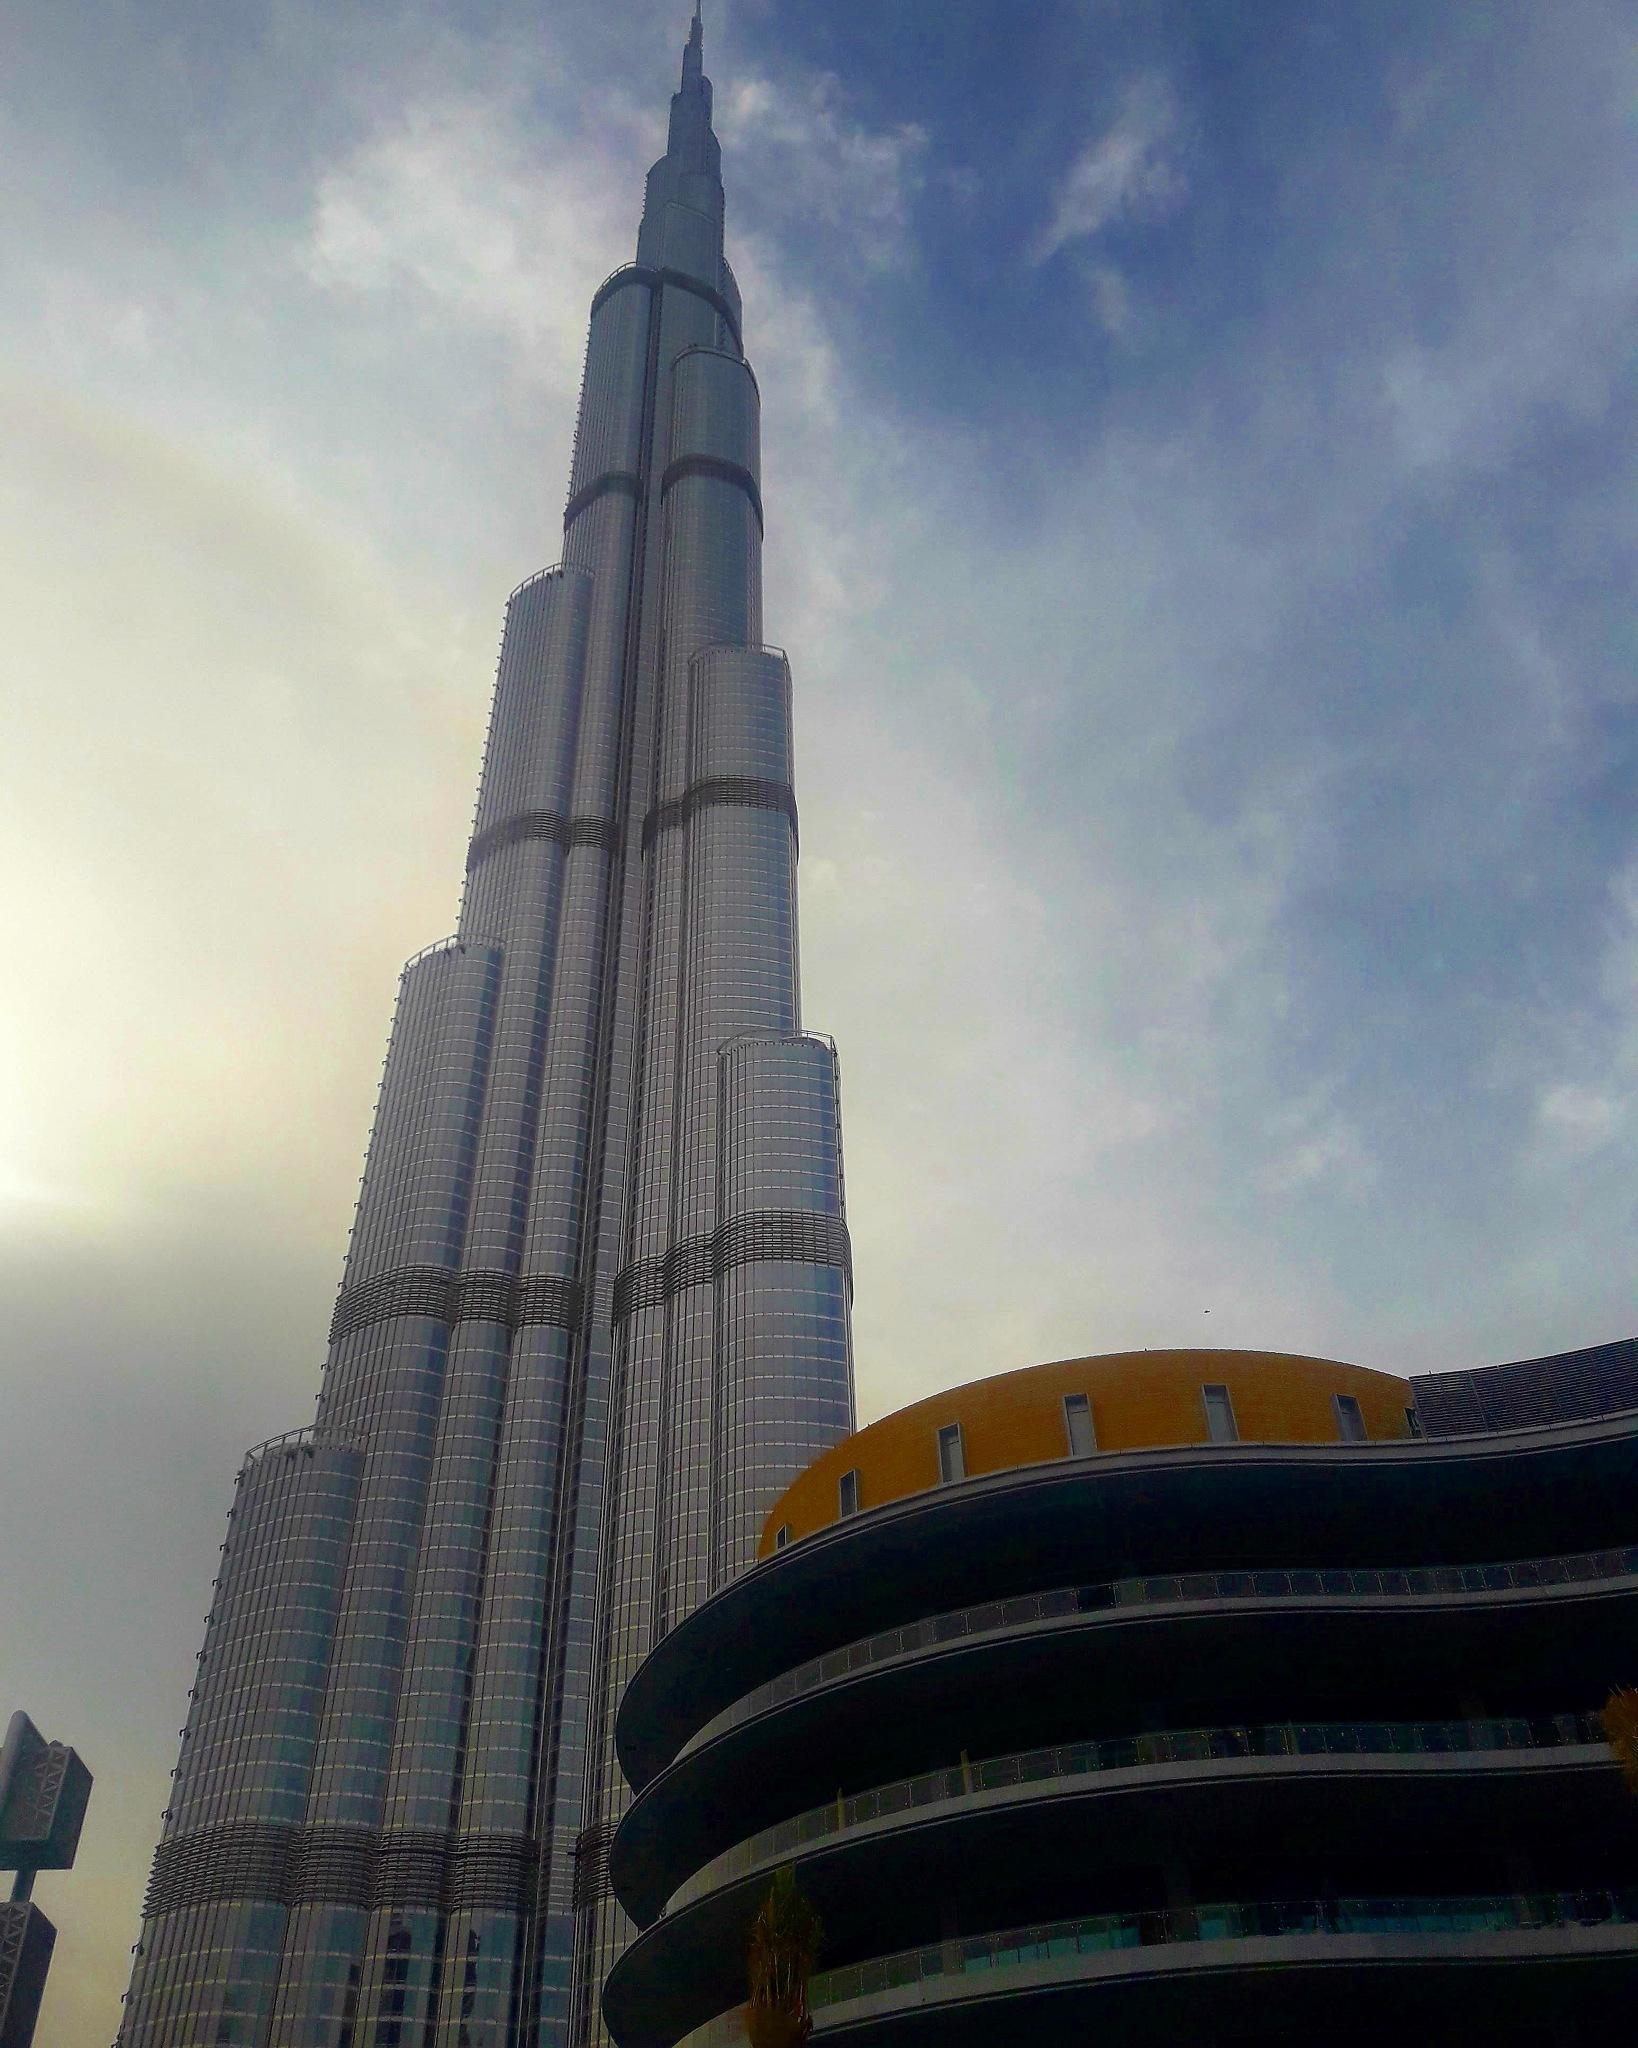 Burj Khalifa at Dubai  by Judo Banerjee